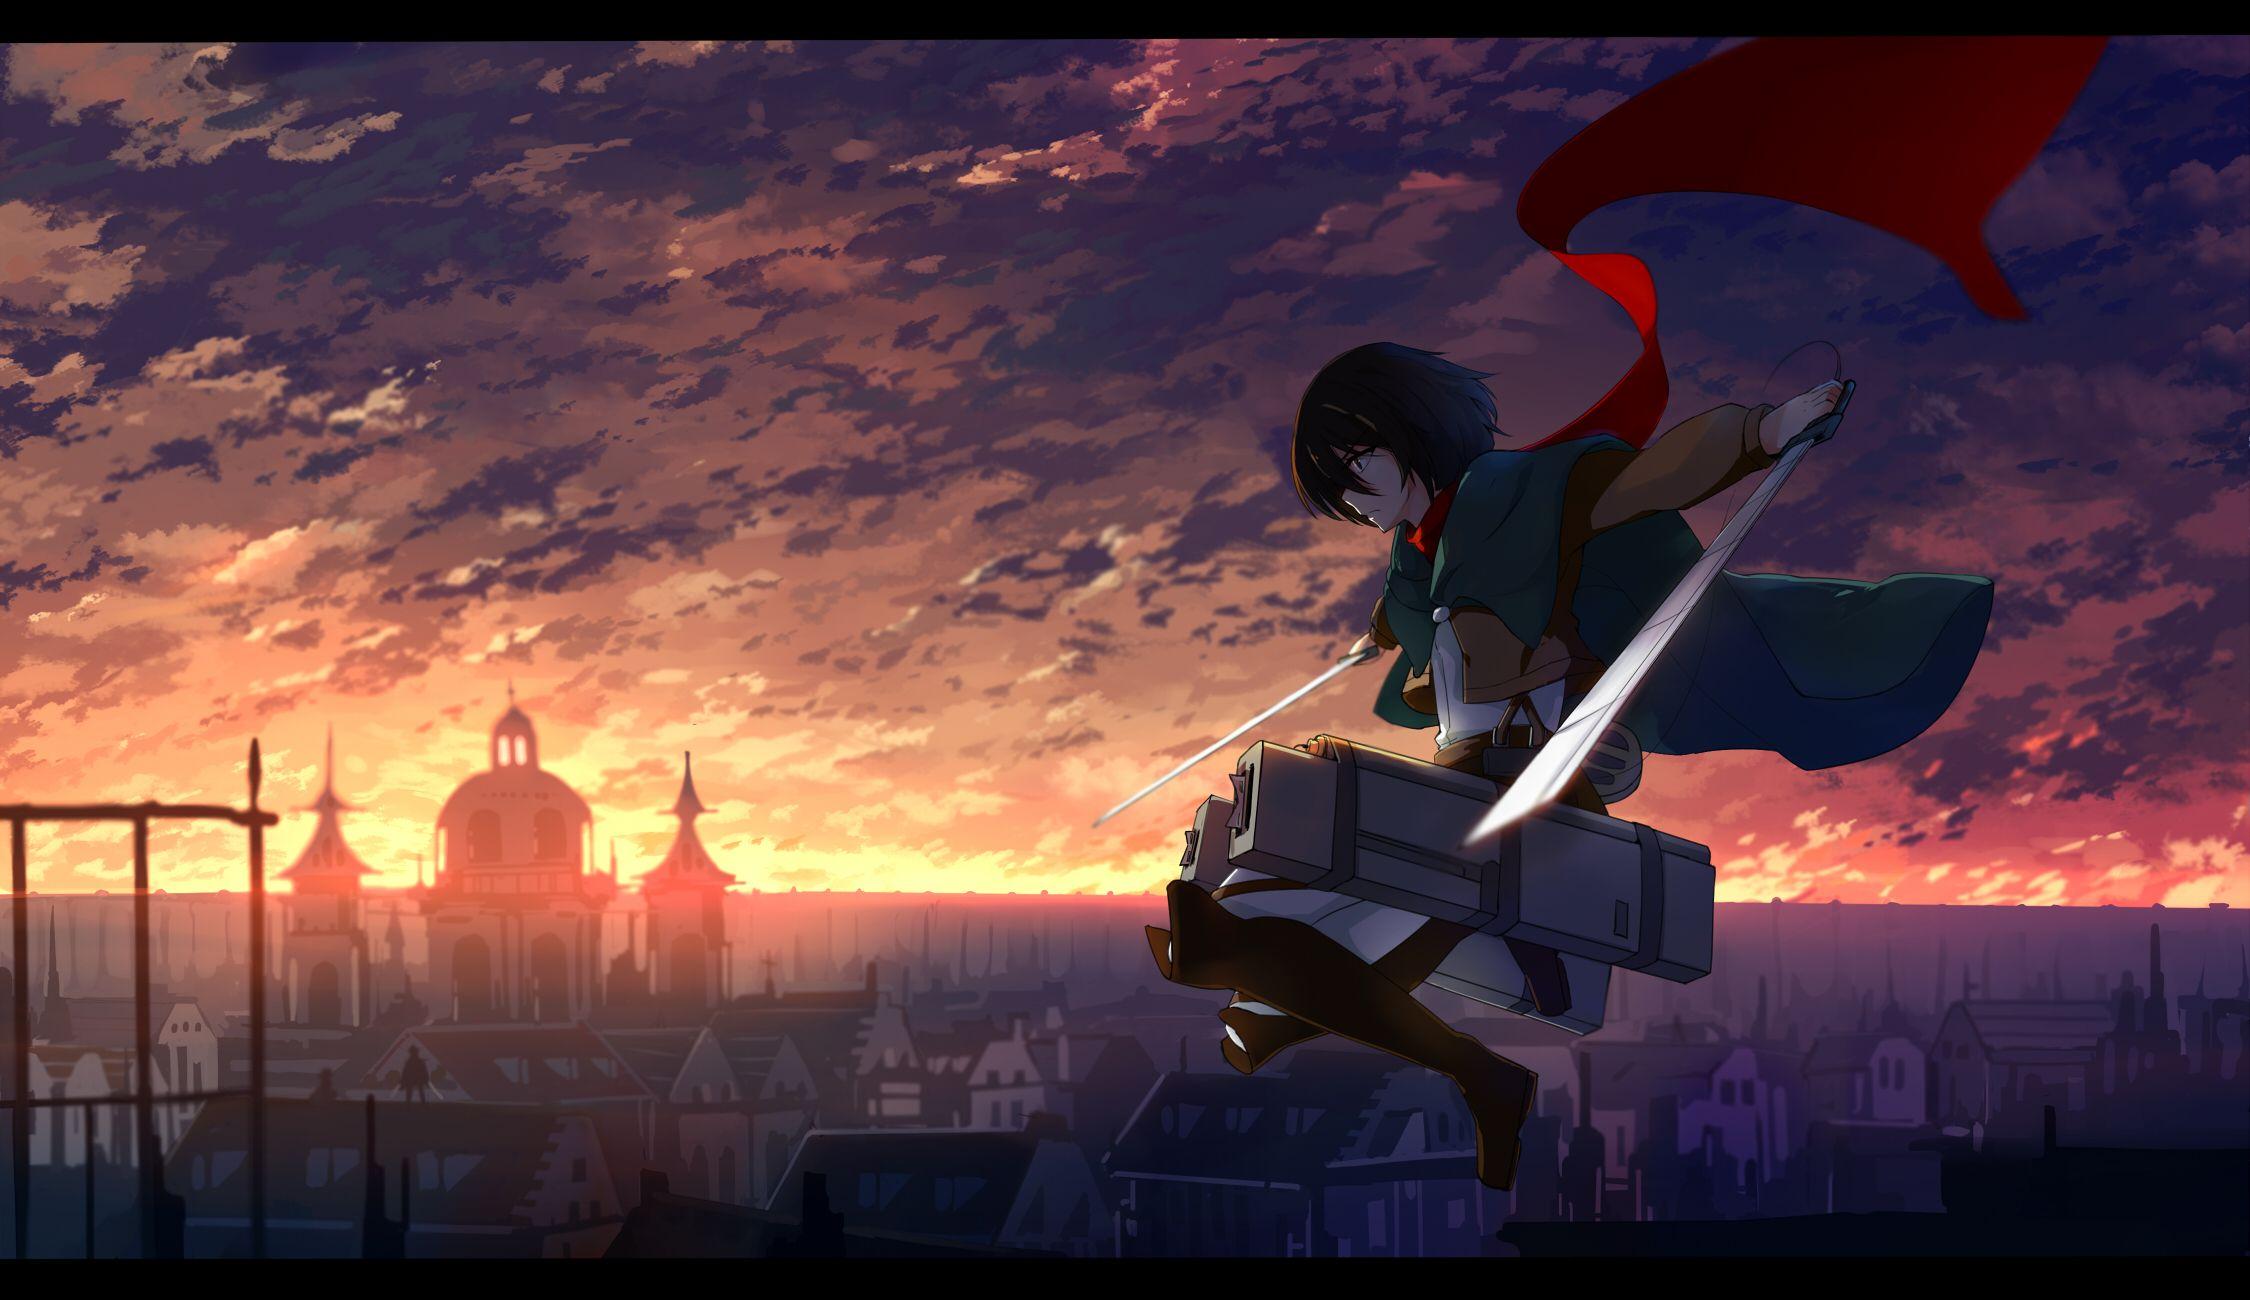 sky warriors shingeki no kyojin mikasa ackerman swords anime wallpaper background